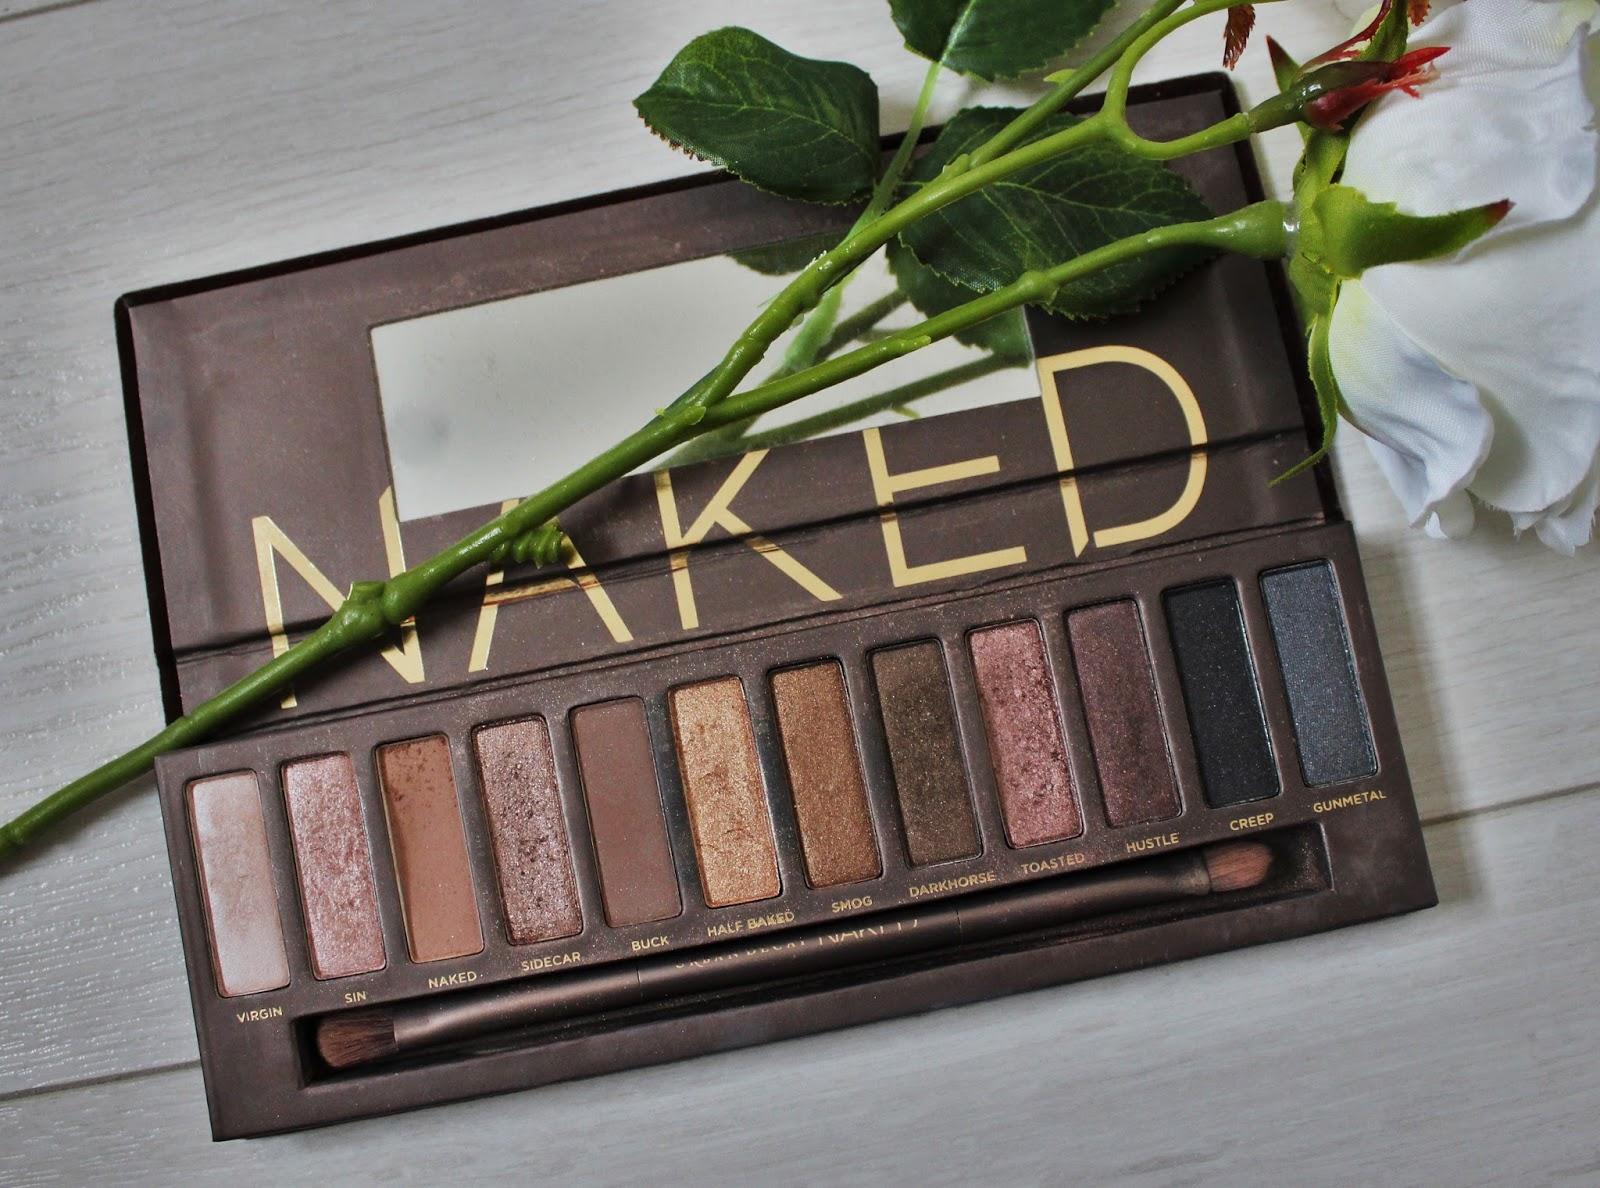 Emma Stone Oscars Inspired Makeup Look - 4